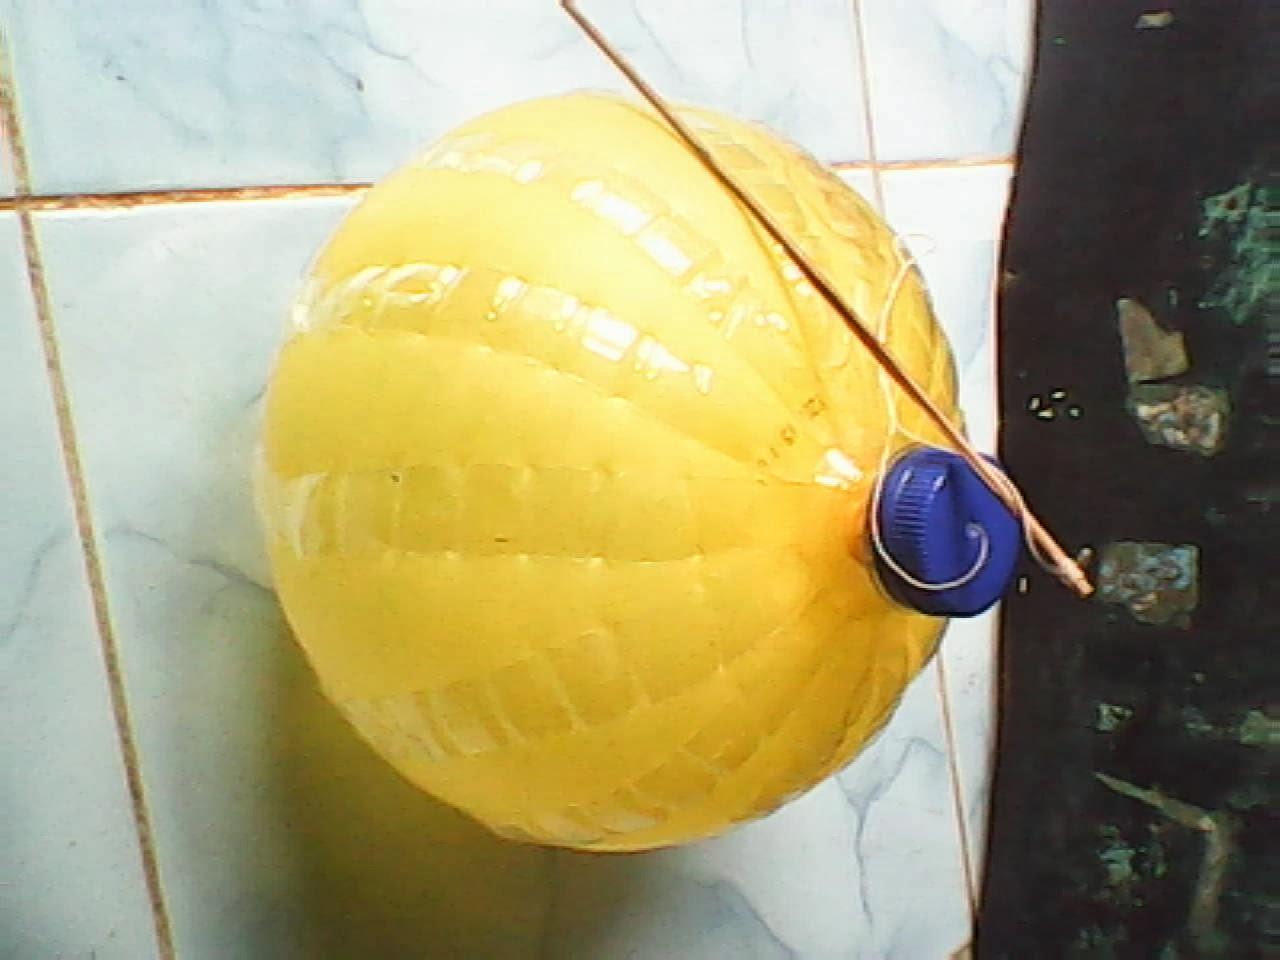 Membuat Lampu Lampion: Membuat Lampu Lampion